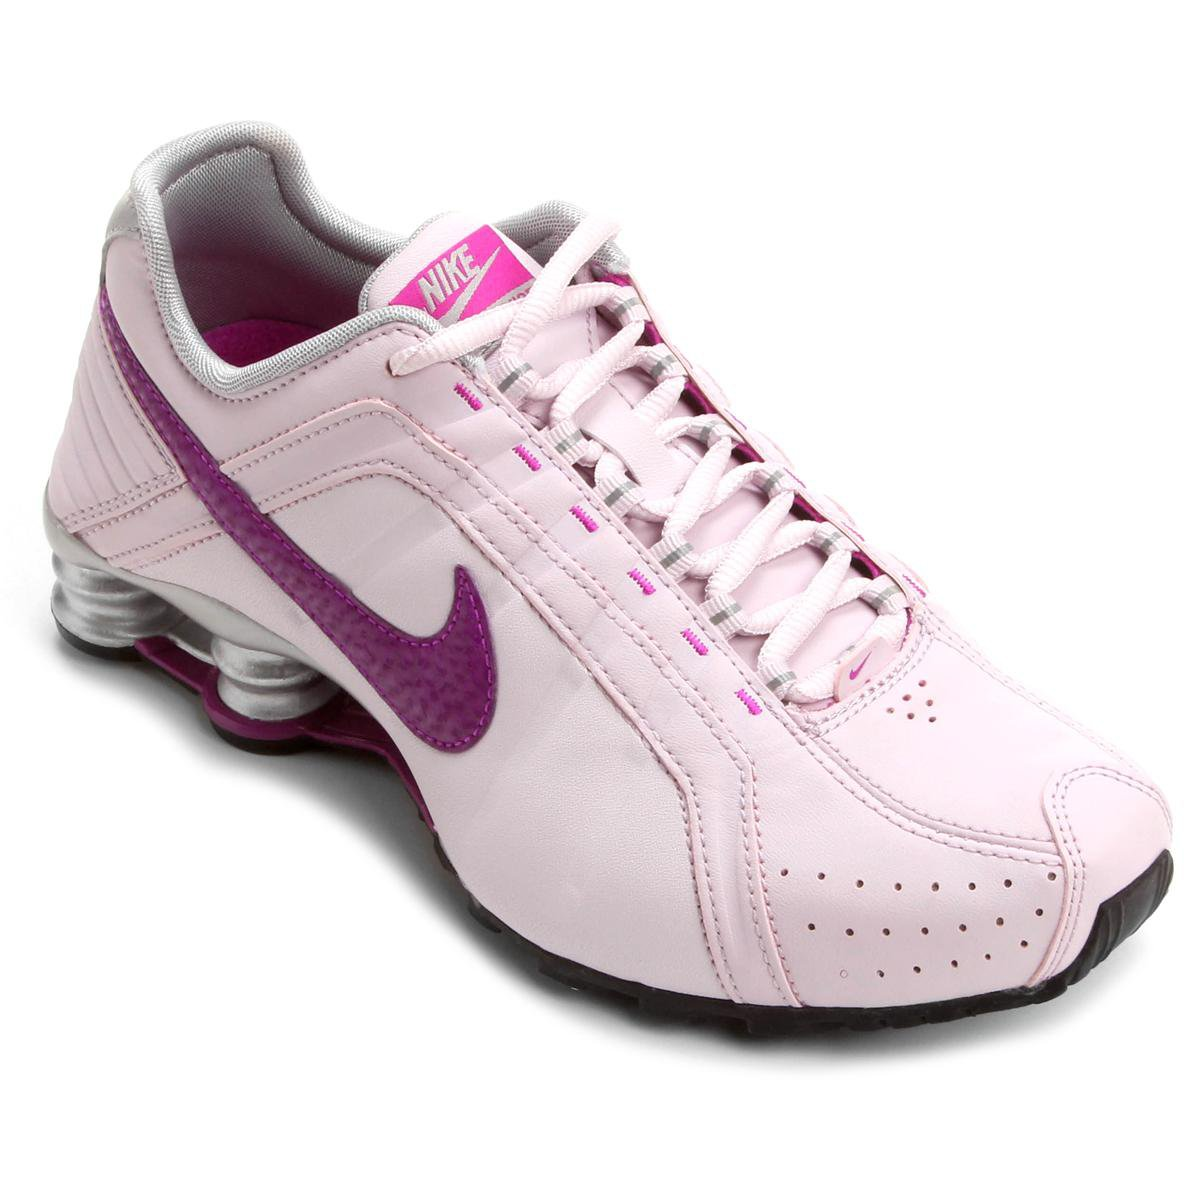 Nike free nz online dating 5